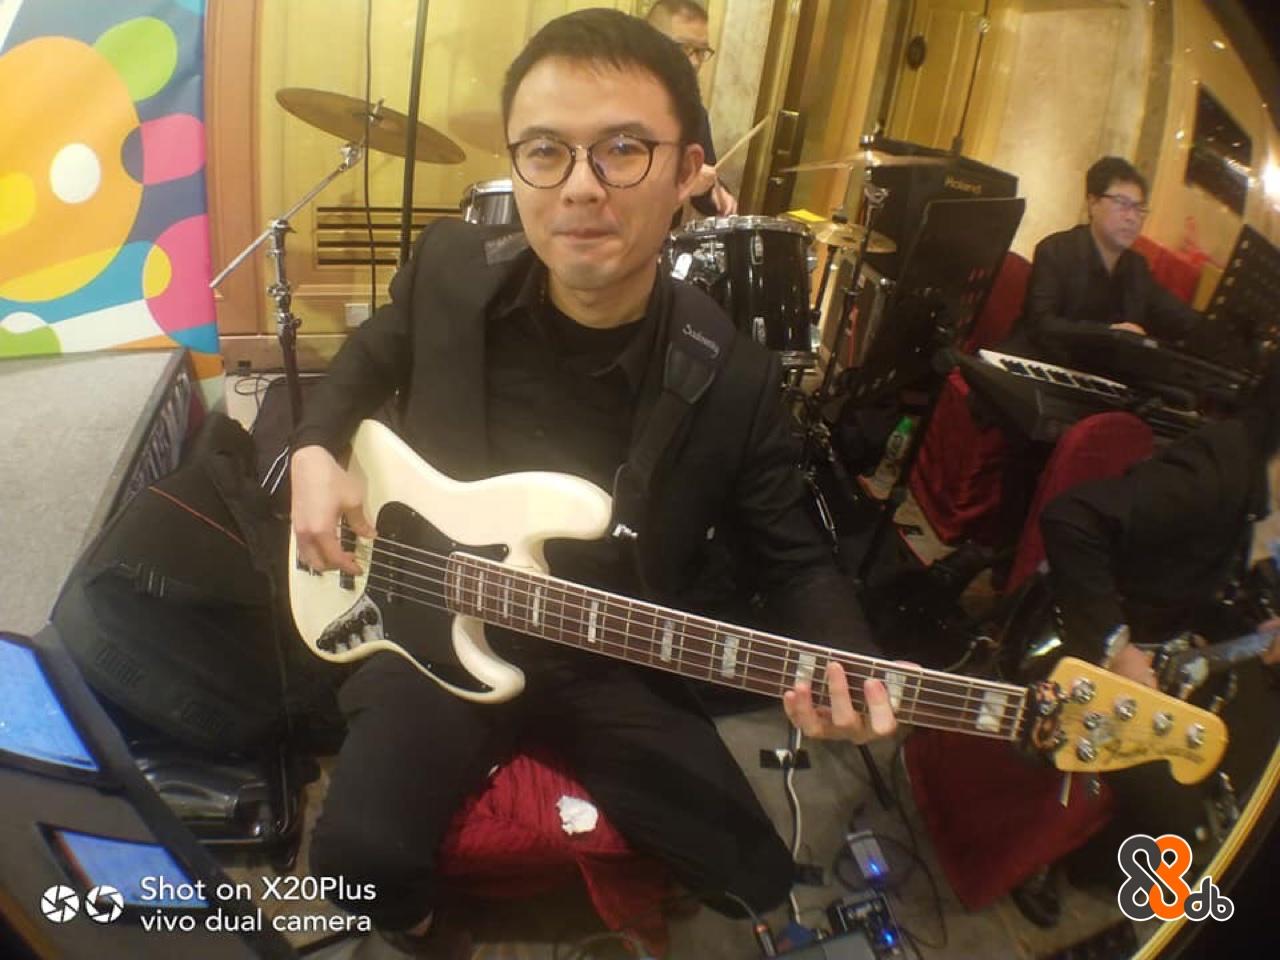 Shot on X20Plus vivo dual camera  guitar,bass guitar,guitarist,string instrument accessory,musician